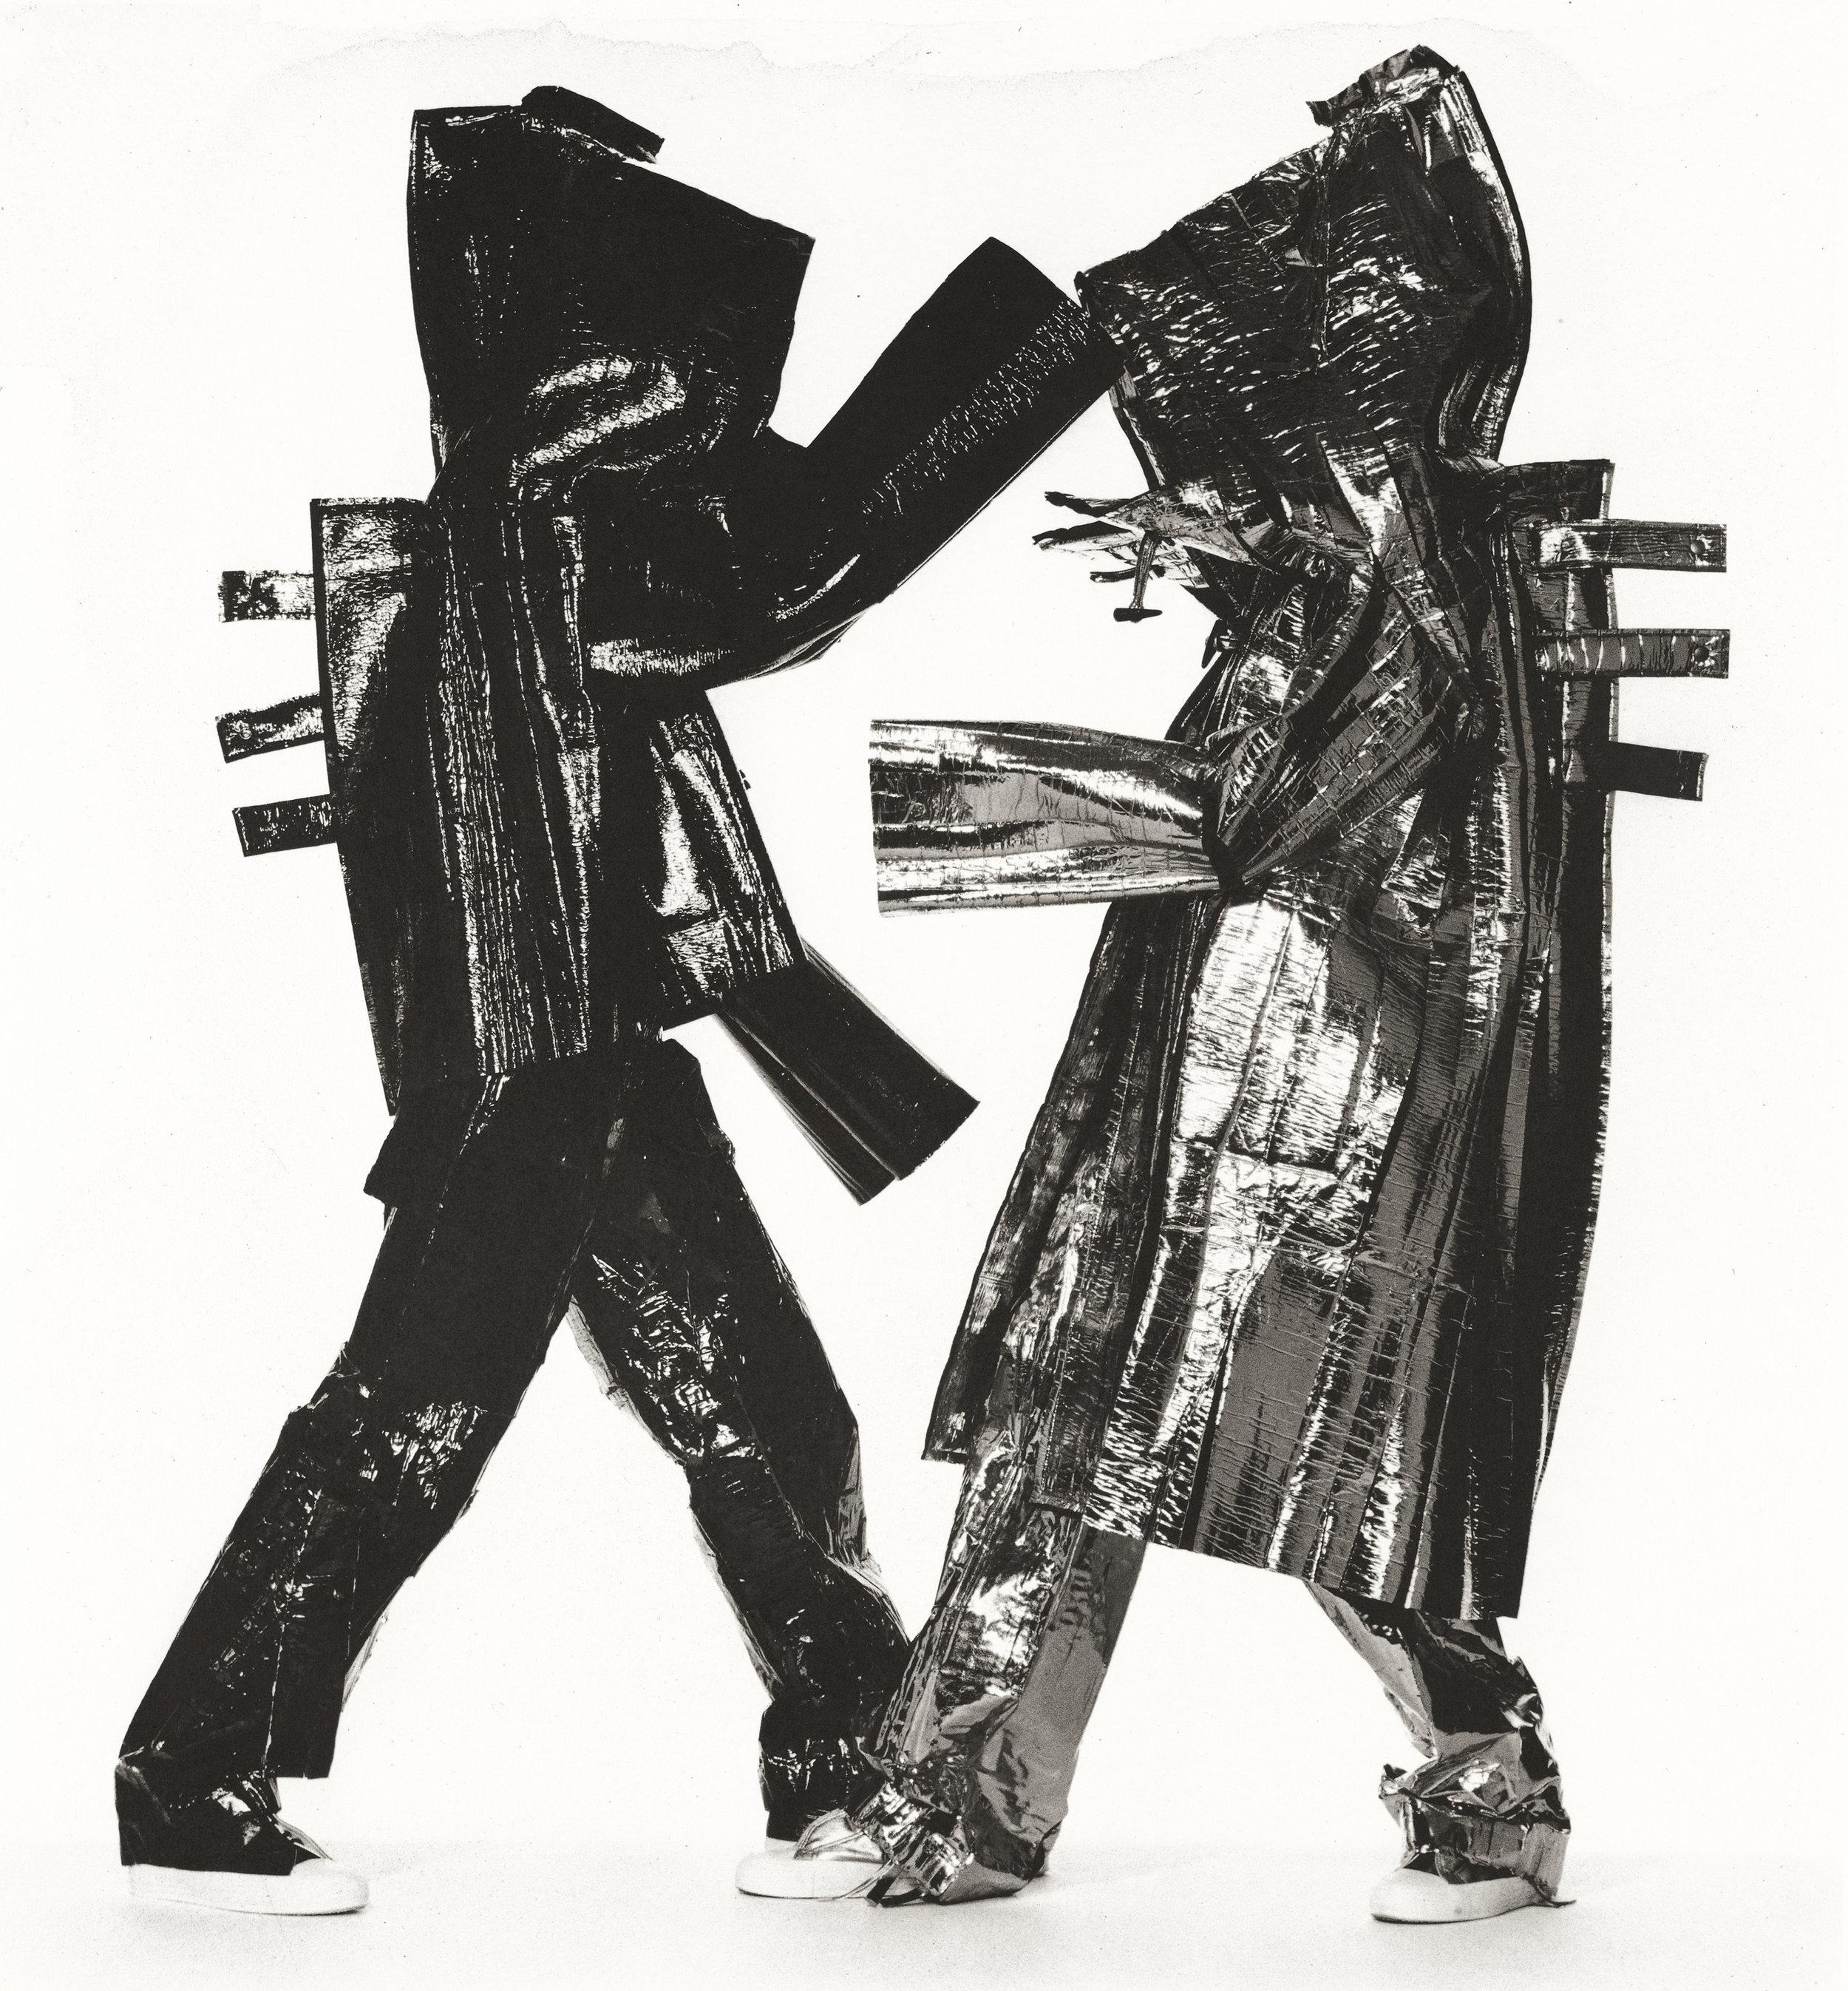 Irving Penn (American, 1917–2009)    Two Miyake Warriors , New York, 1998    Platinum-palladium print, 1999  21 × 19 ⅝ in. (53.5 × 49.8 cm)  The Metropolitan Museum of Art, New York  Promised Gift of The Irving Penn Foundation  © The Irving Penn Foundation